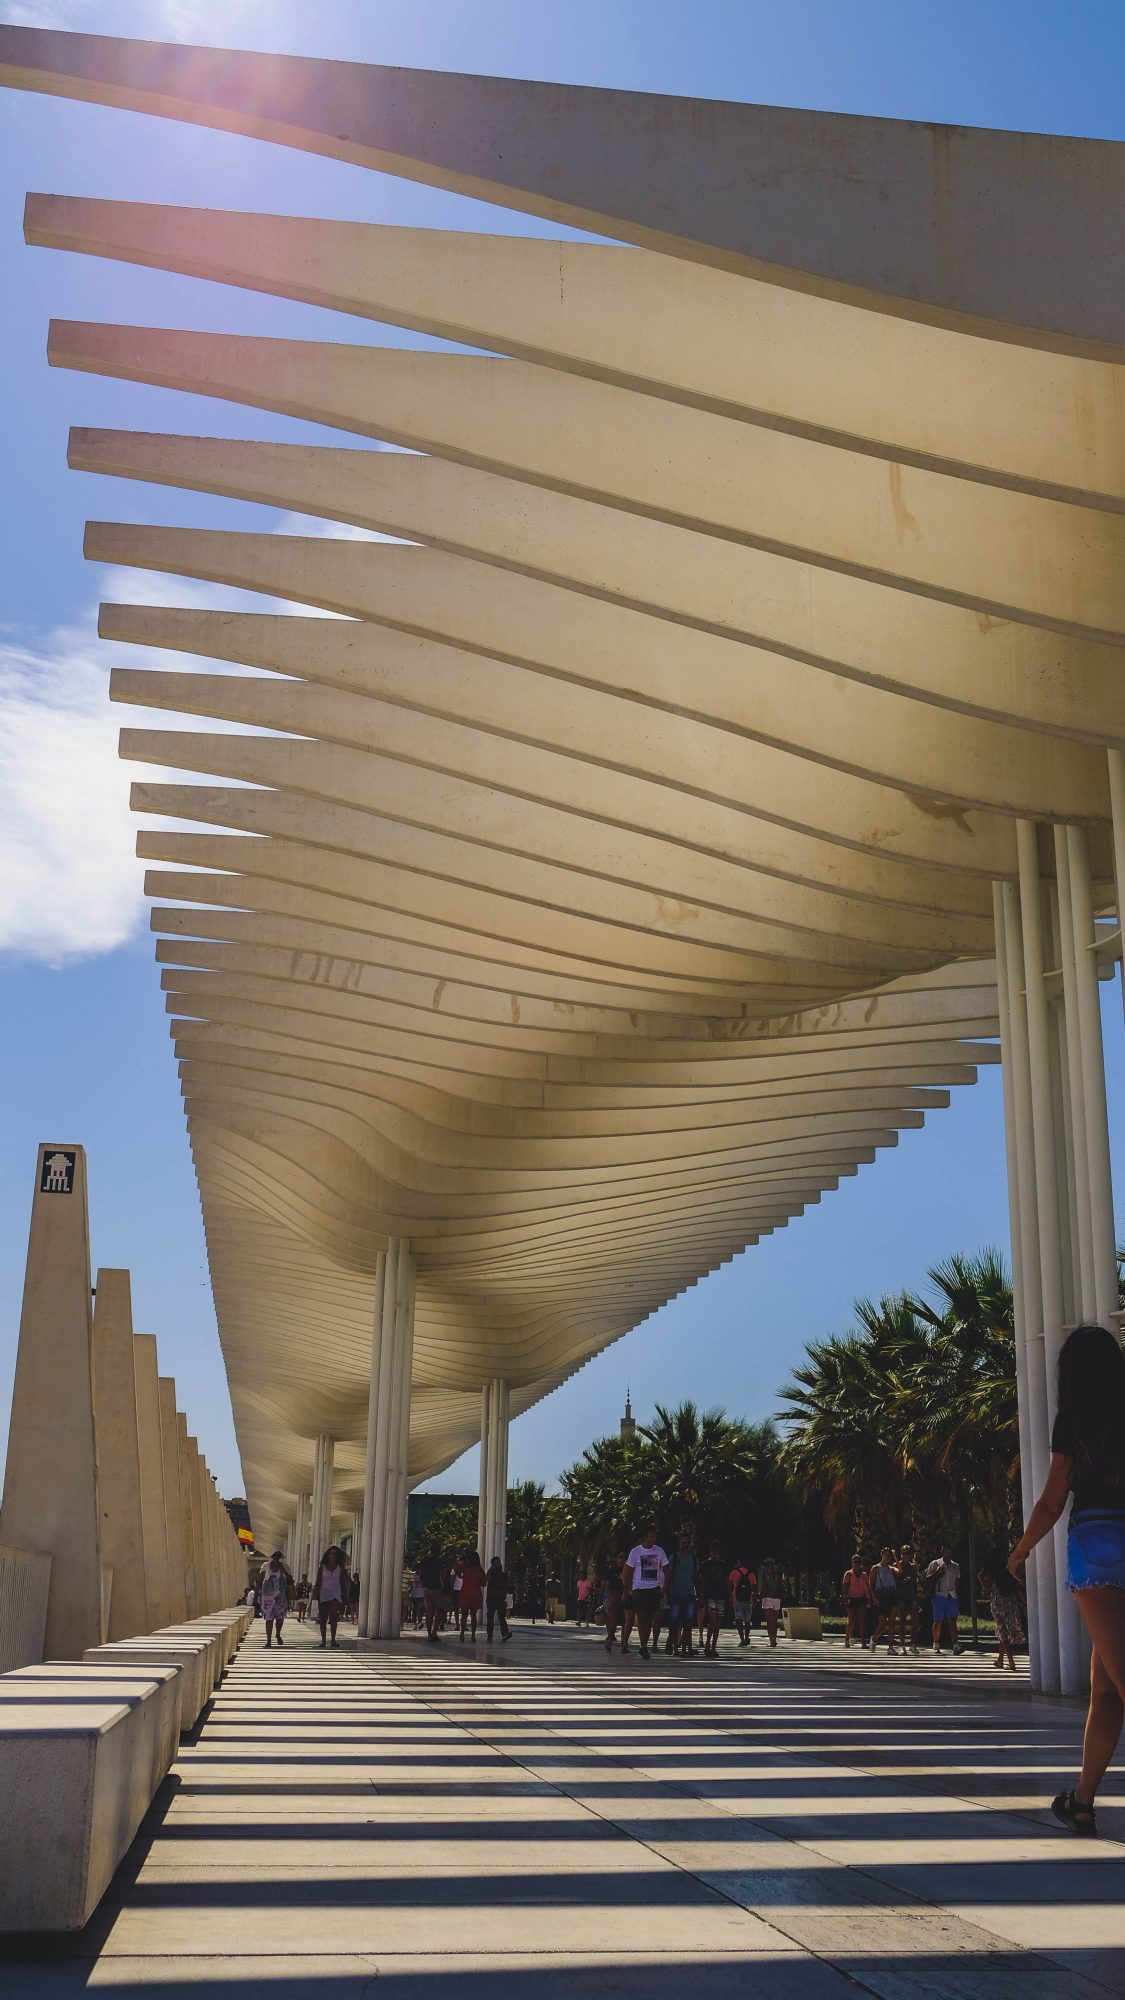 Promenade sur les quais du port - Malaga, Espagne